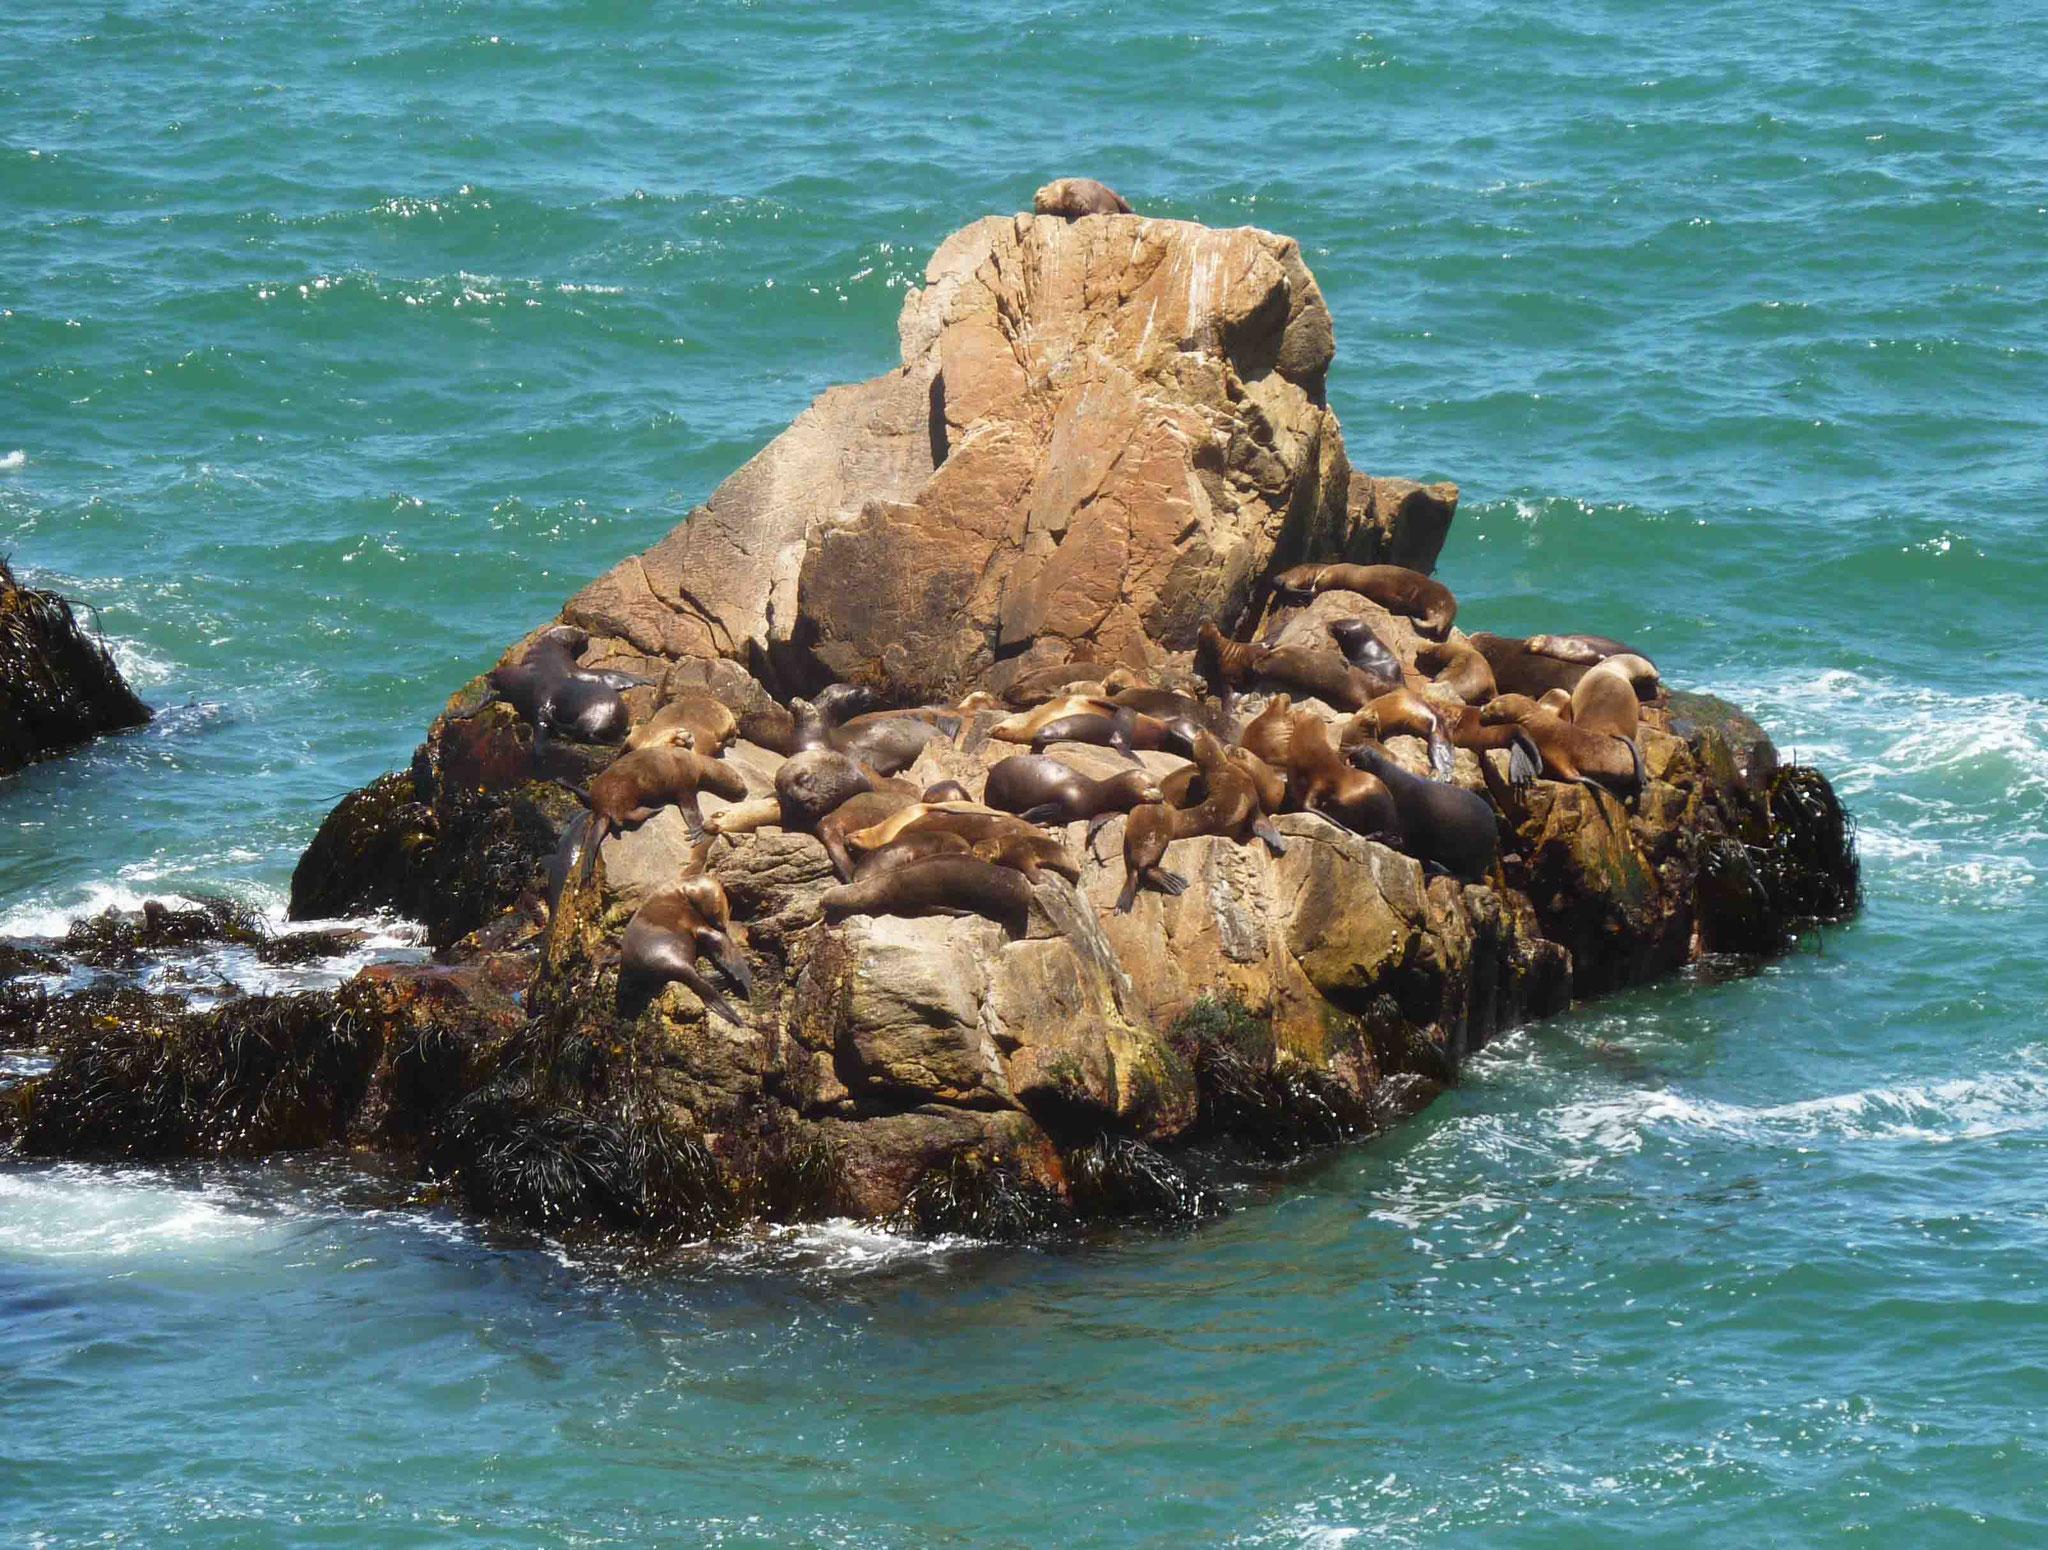 Les loups de mer (Lobos del mar) juchés sur leur rocher habituel